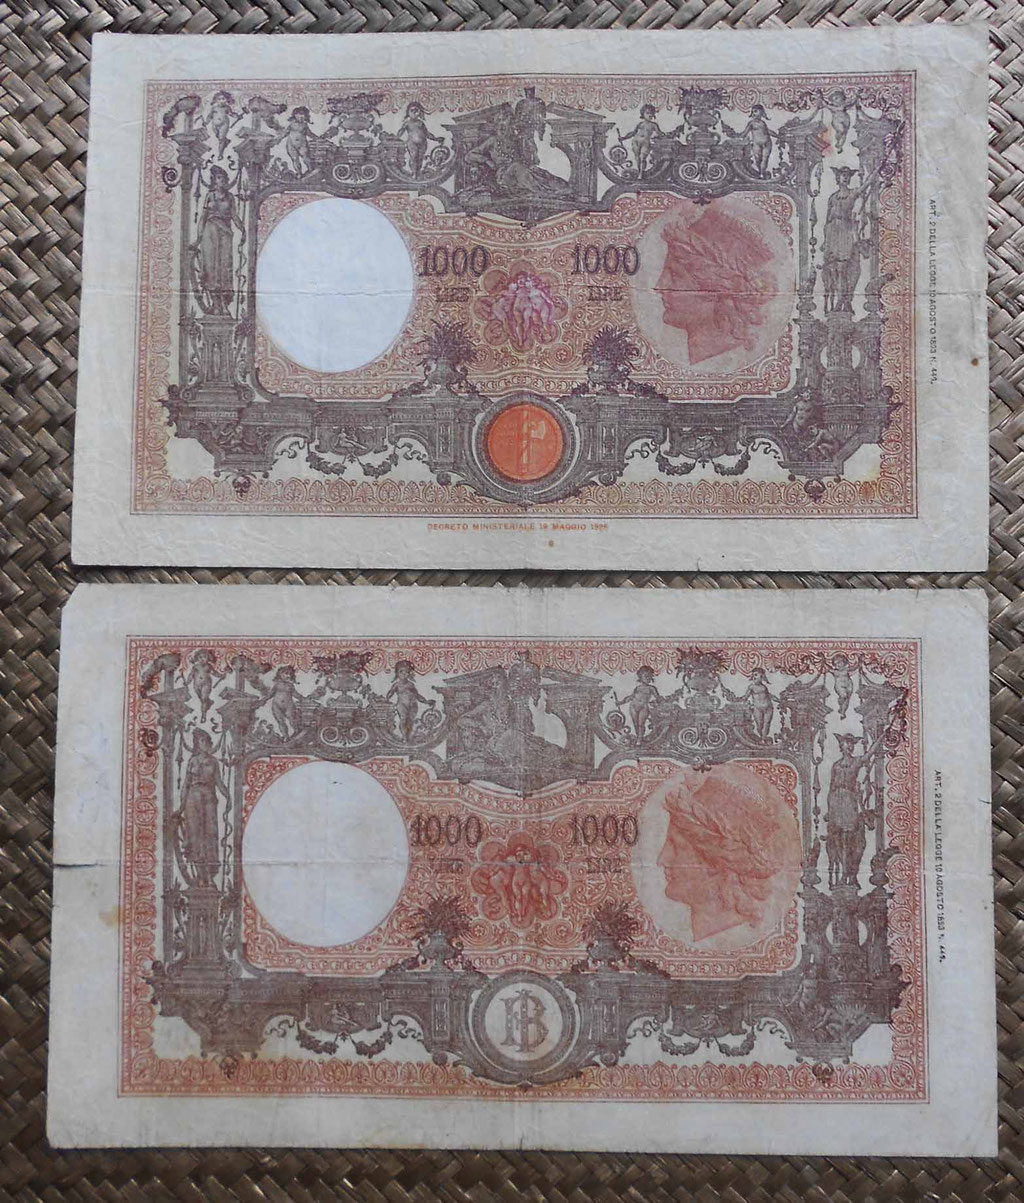 Italia 1000 liras Barbetti M Grande edic. 1943 y 1946 reversos